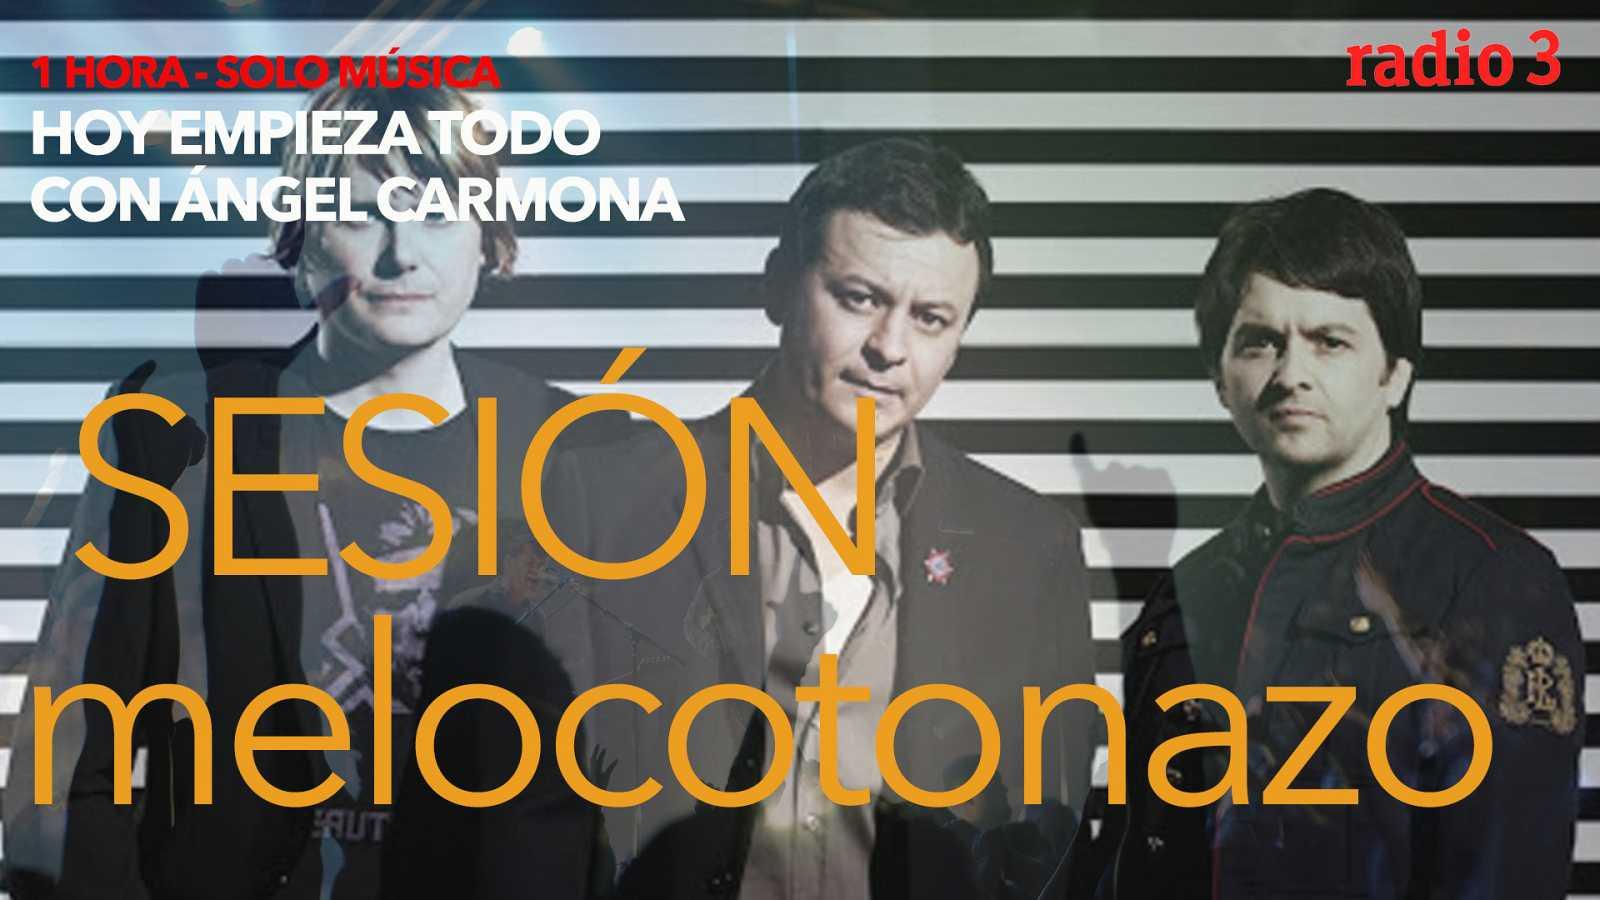 Hoy empieza todo con Ángel Carmona - #SesiónMelocotonazo: Stereolab, Manic Street Preachers, Menta... - 06/05/21 - escuchar ahora